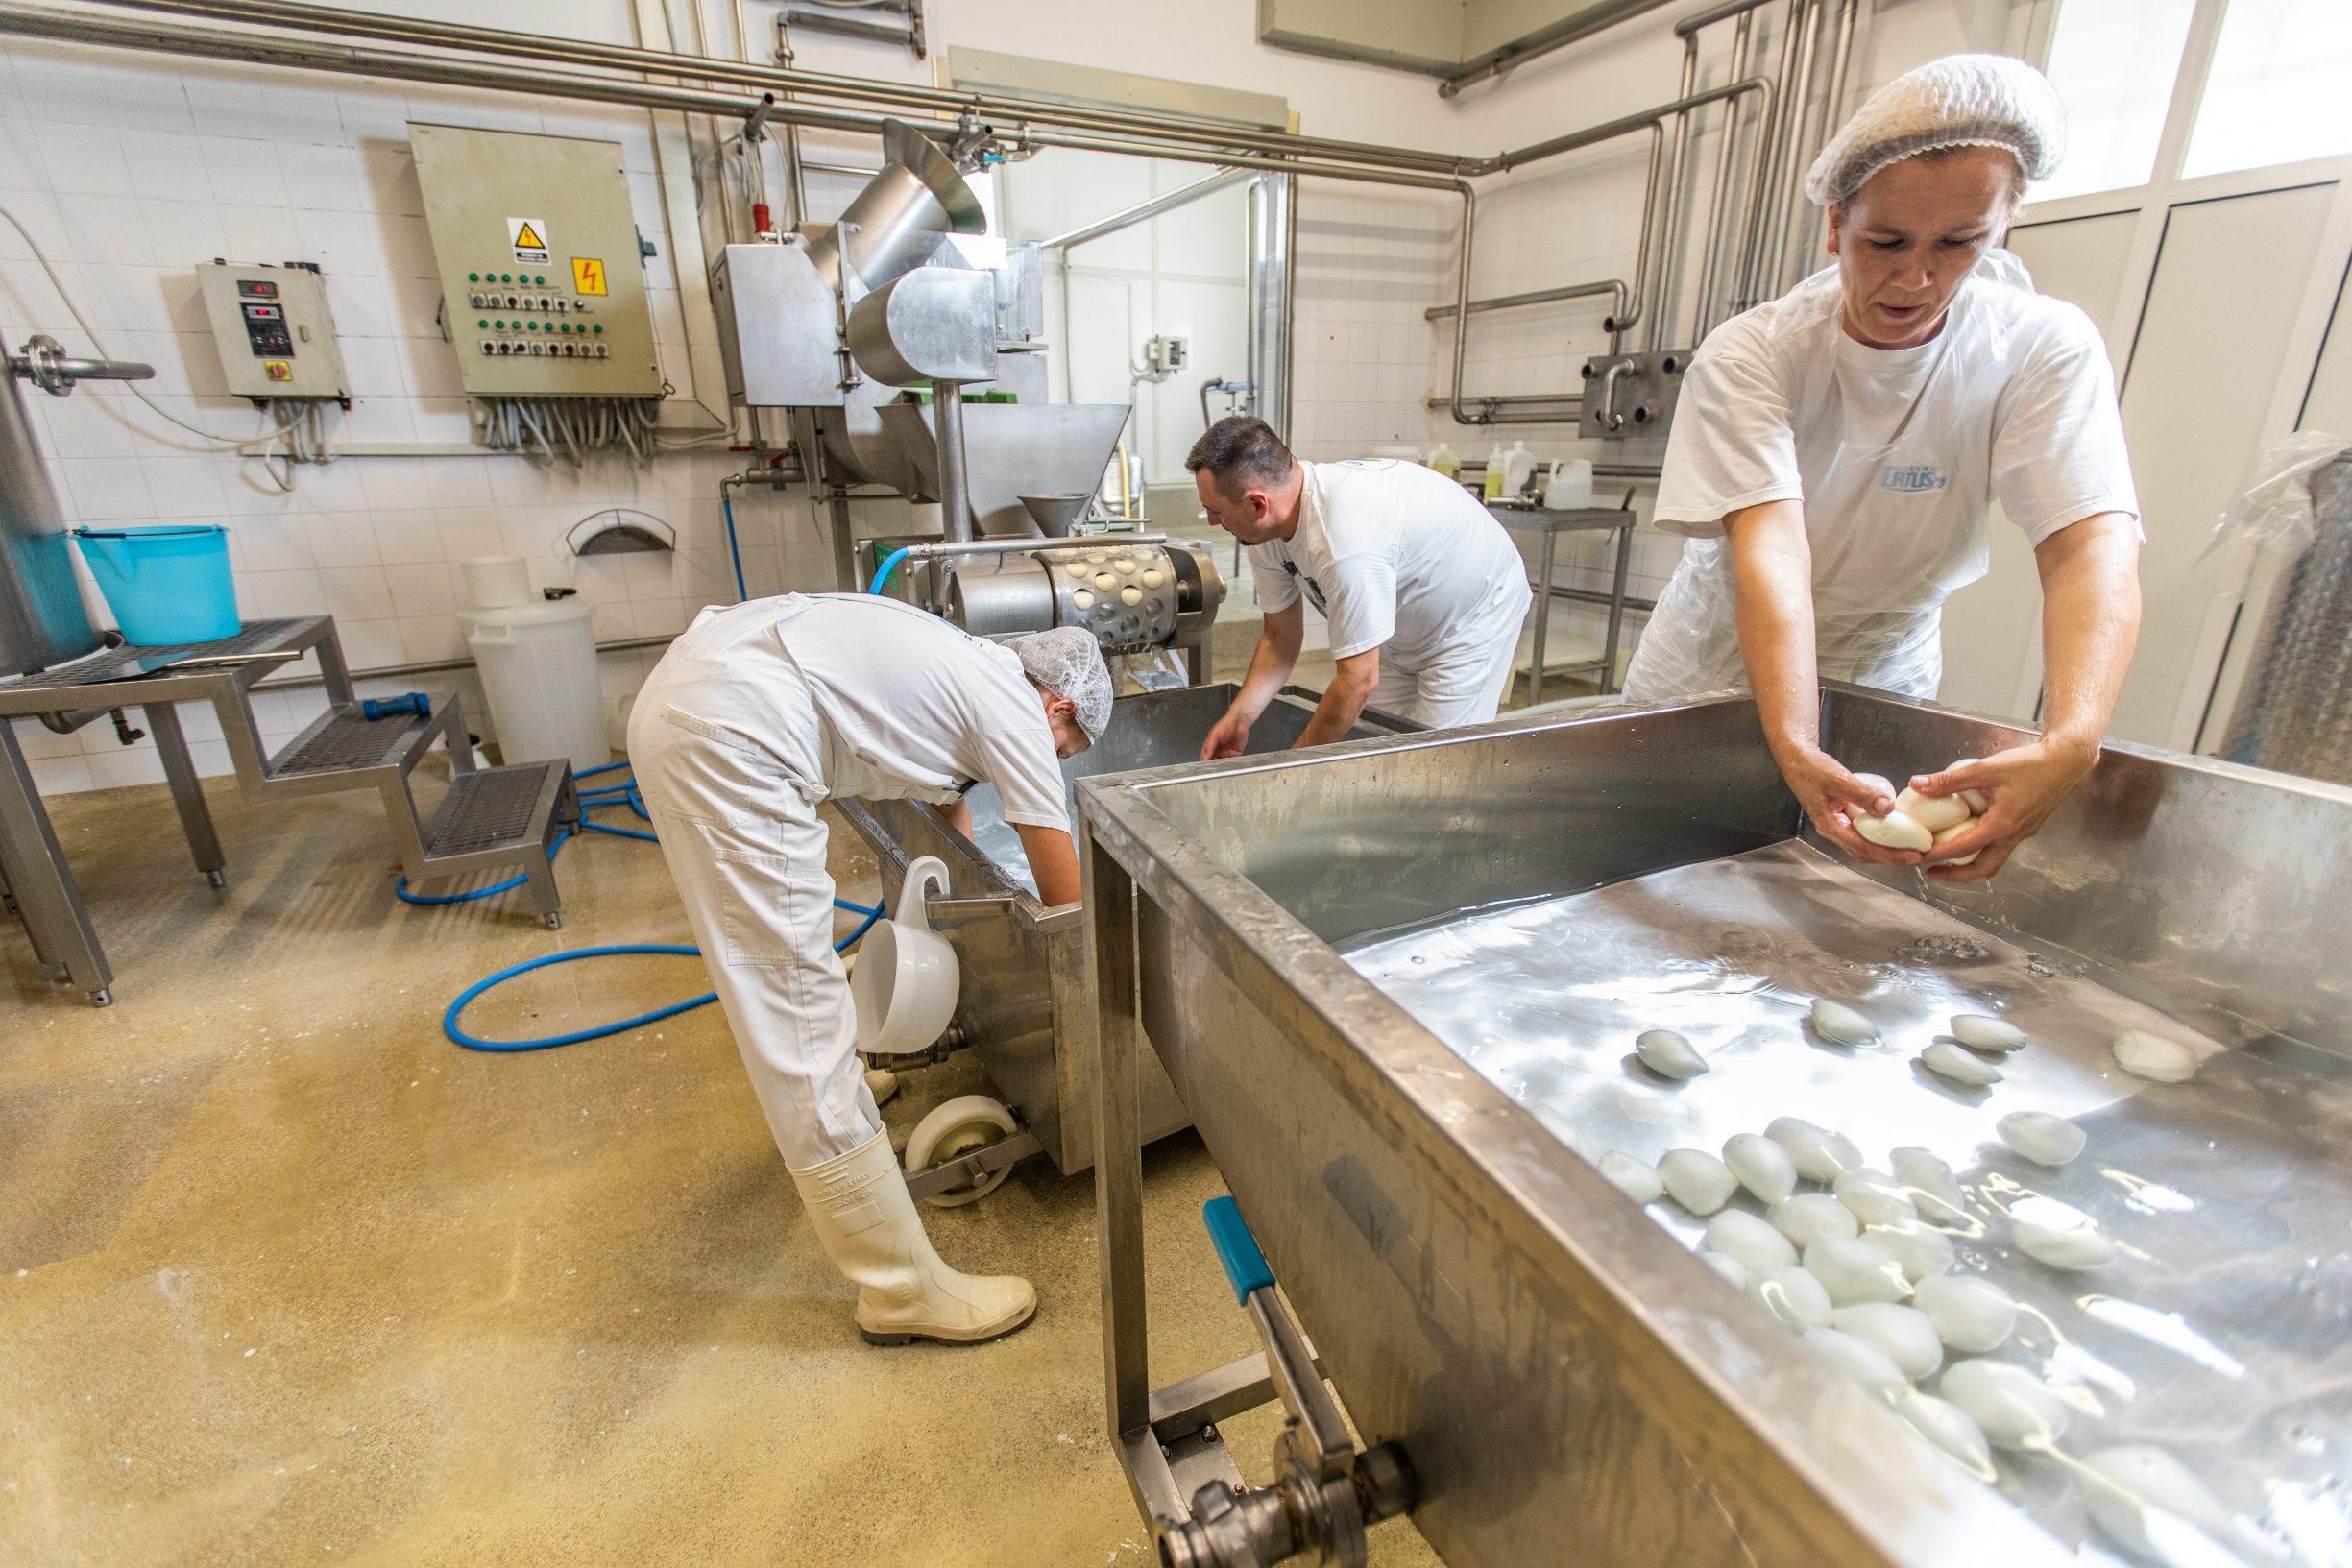 Zminj, 031019. Proizvodnja mozzarelle u Mljekari Latus. Na fotografiji: vadjenje mozzarelle iz stroja. Foto: Matija Djanjesic / CROPIX